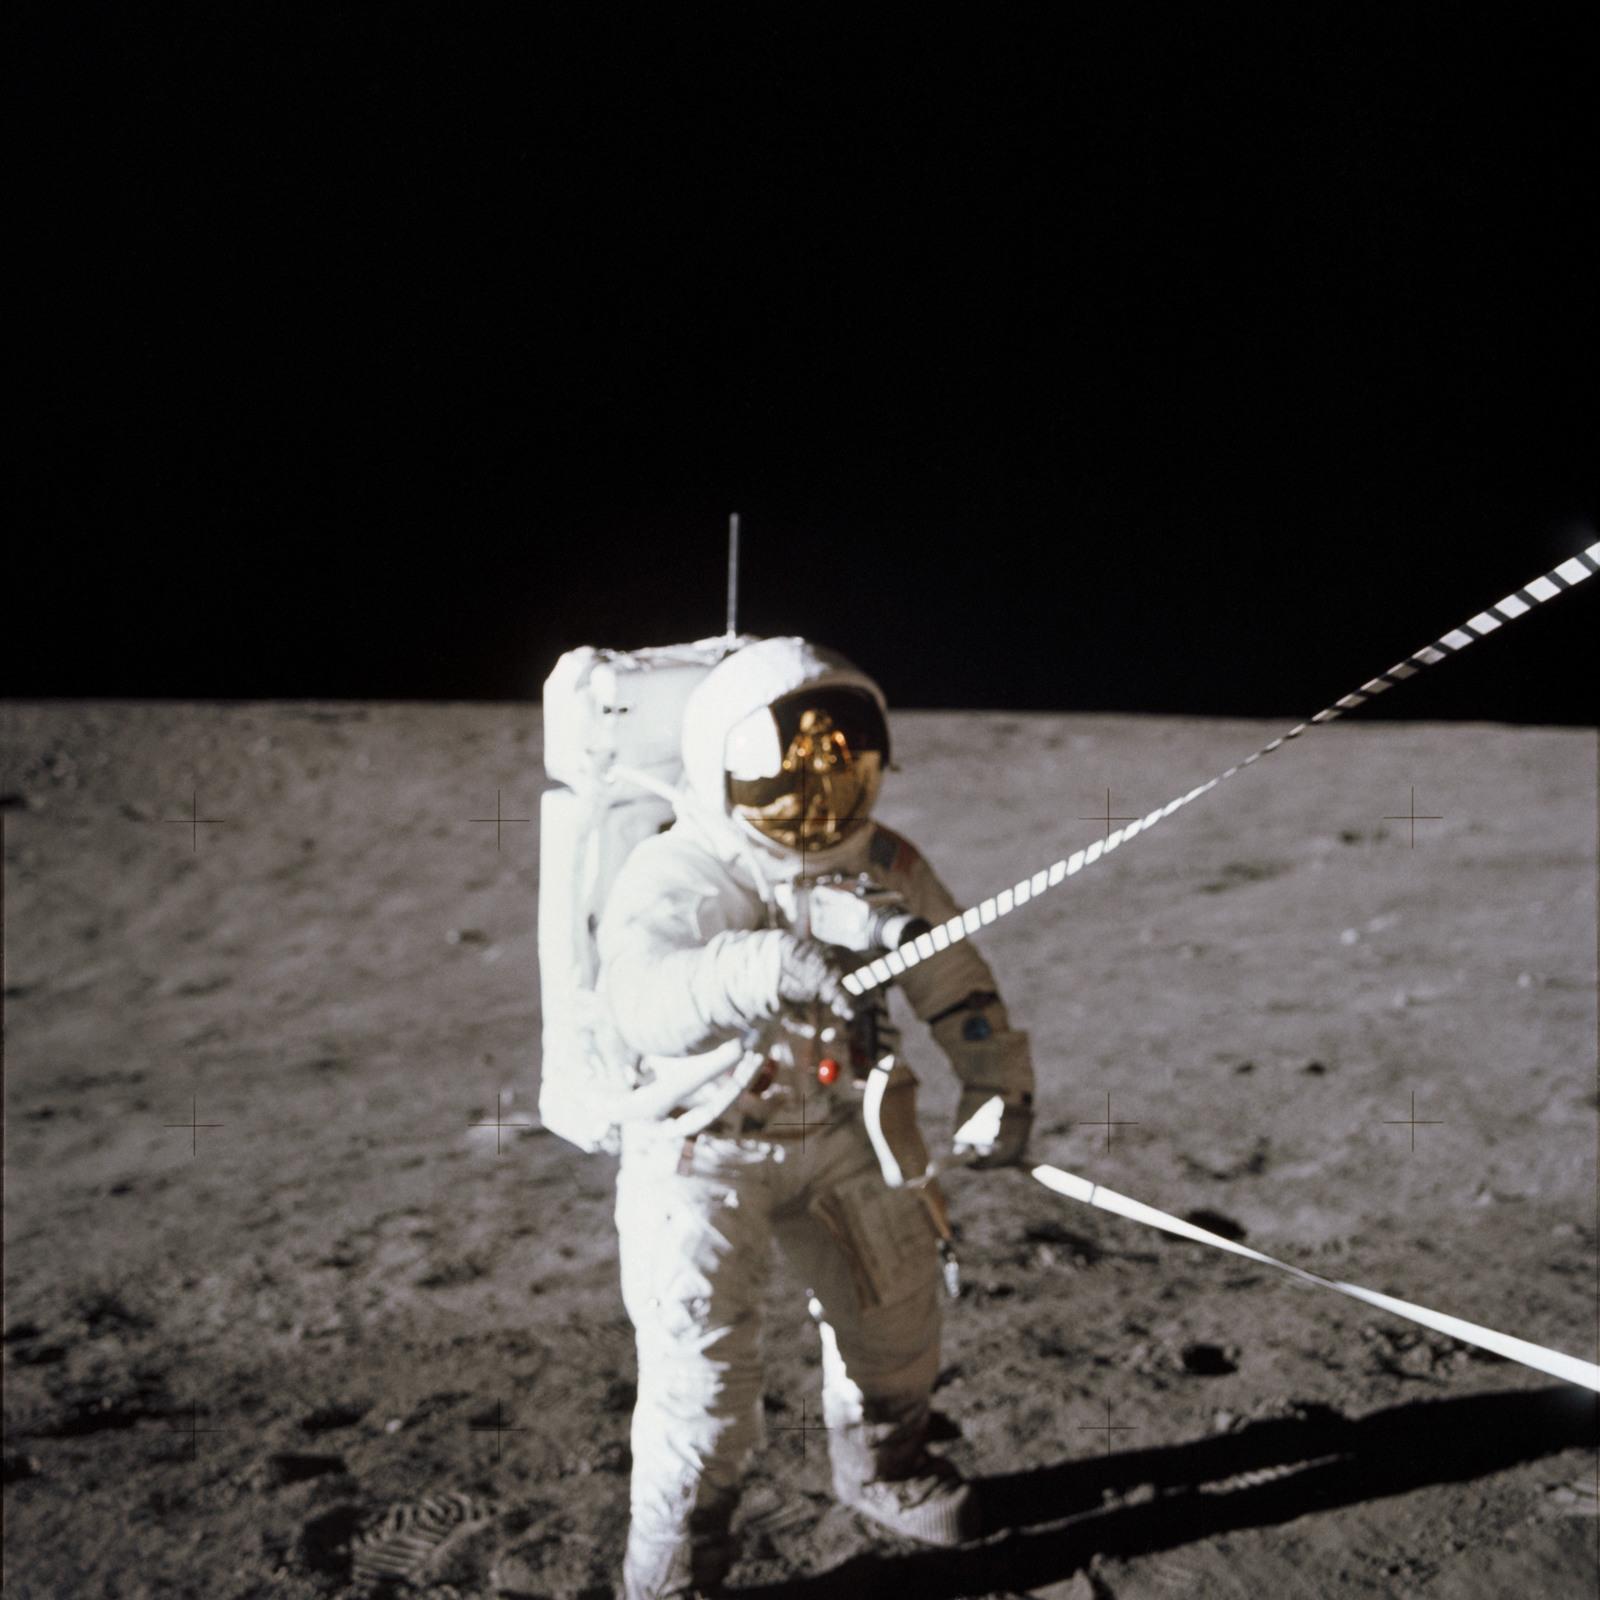 https://cdn10.picryl.com/photo/1969/11/19/as12-47-6914-apollo-12-apollo-12-mission-image-cdr-with-lunar-equipment-conveyer-1b550c-1600.jpg